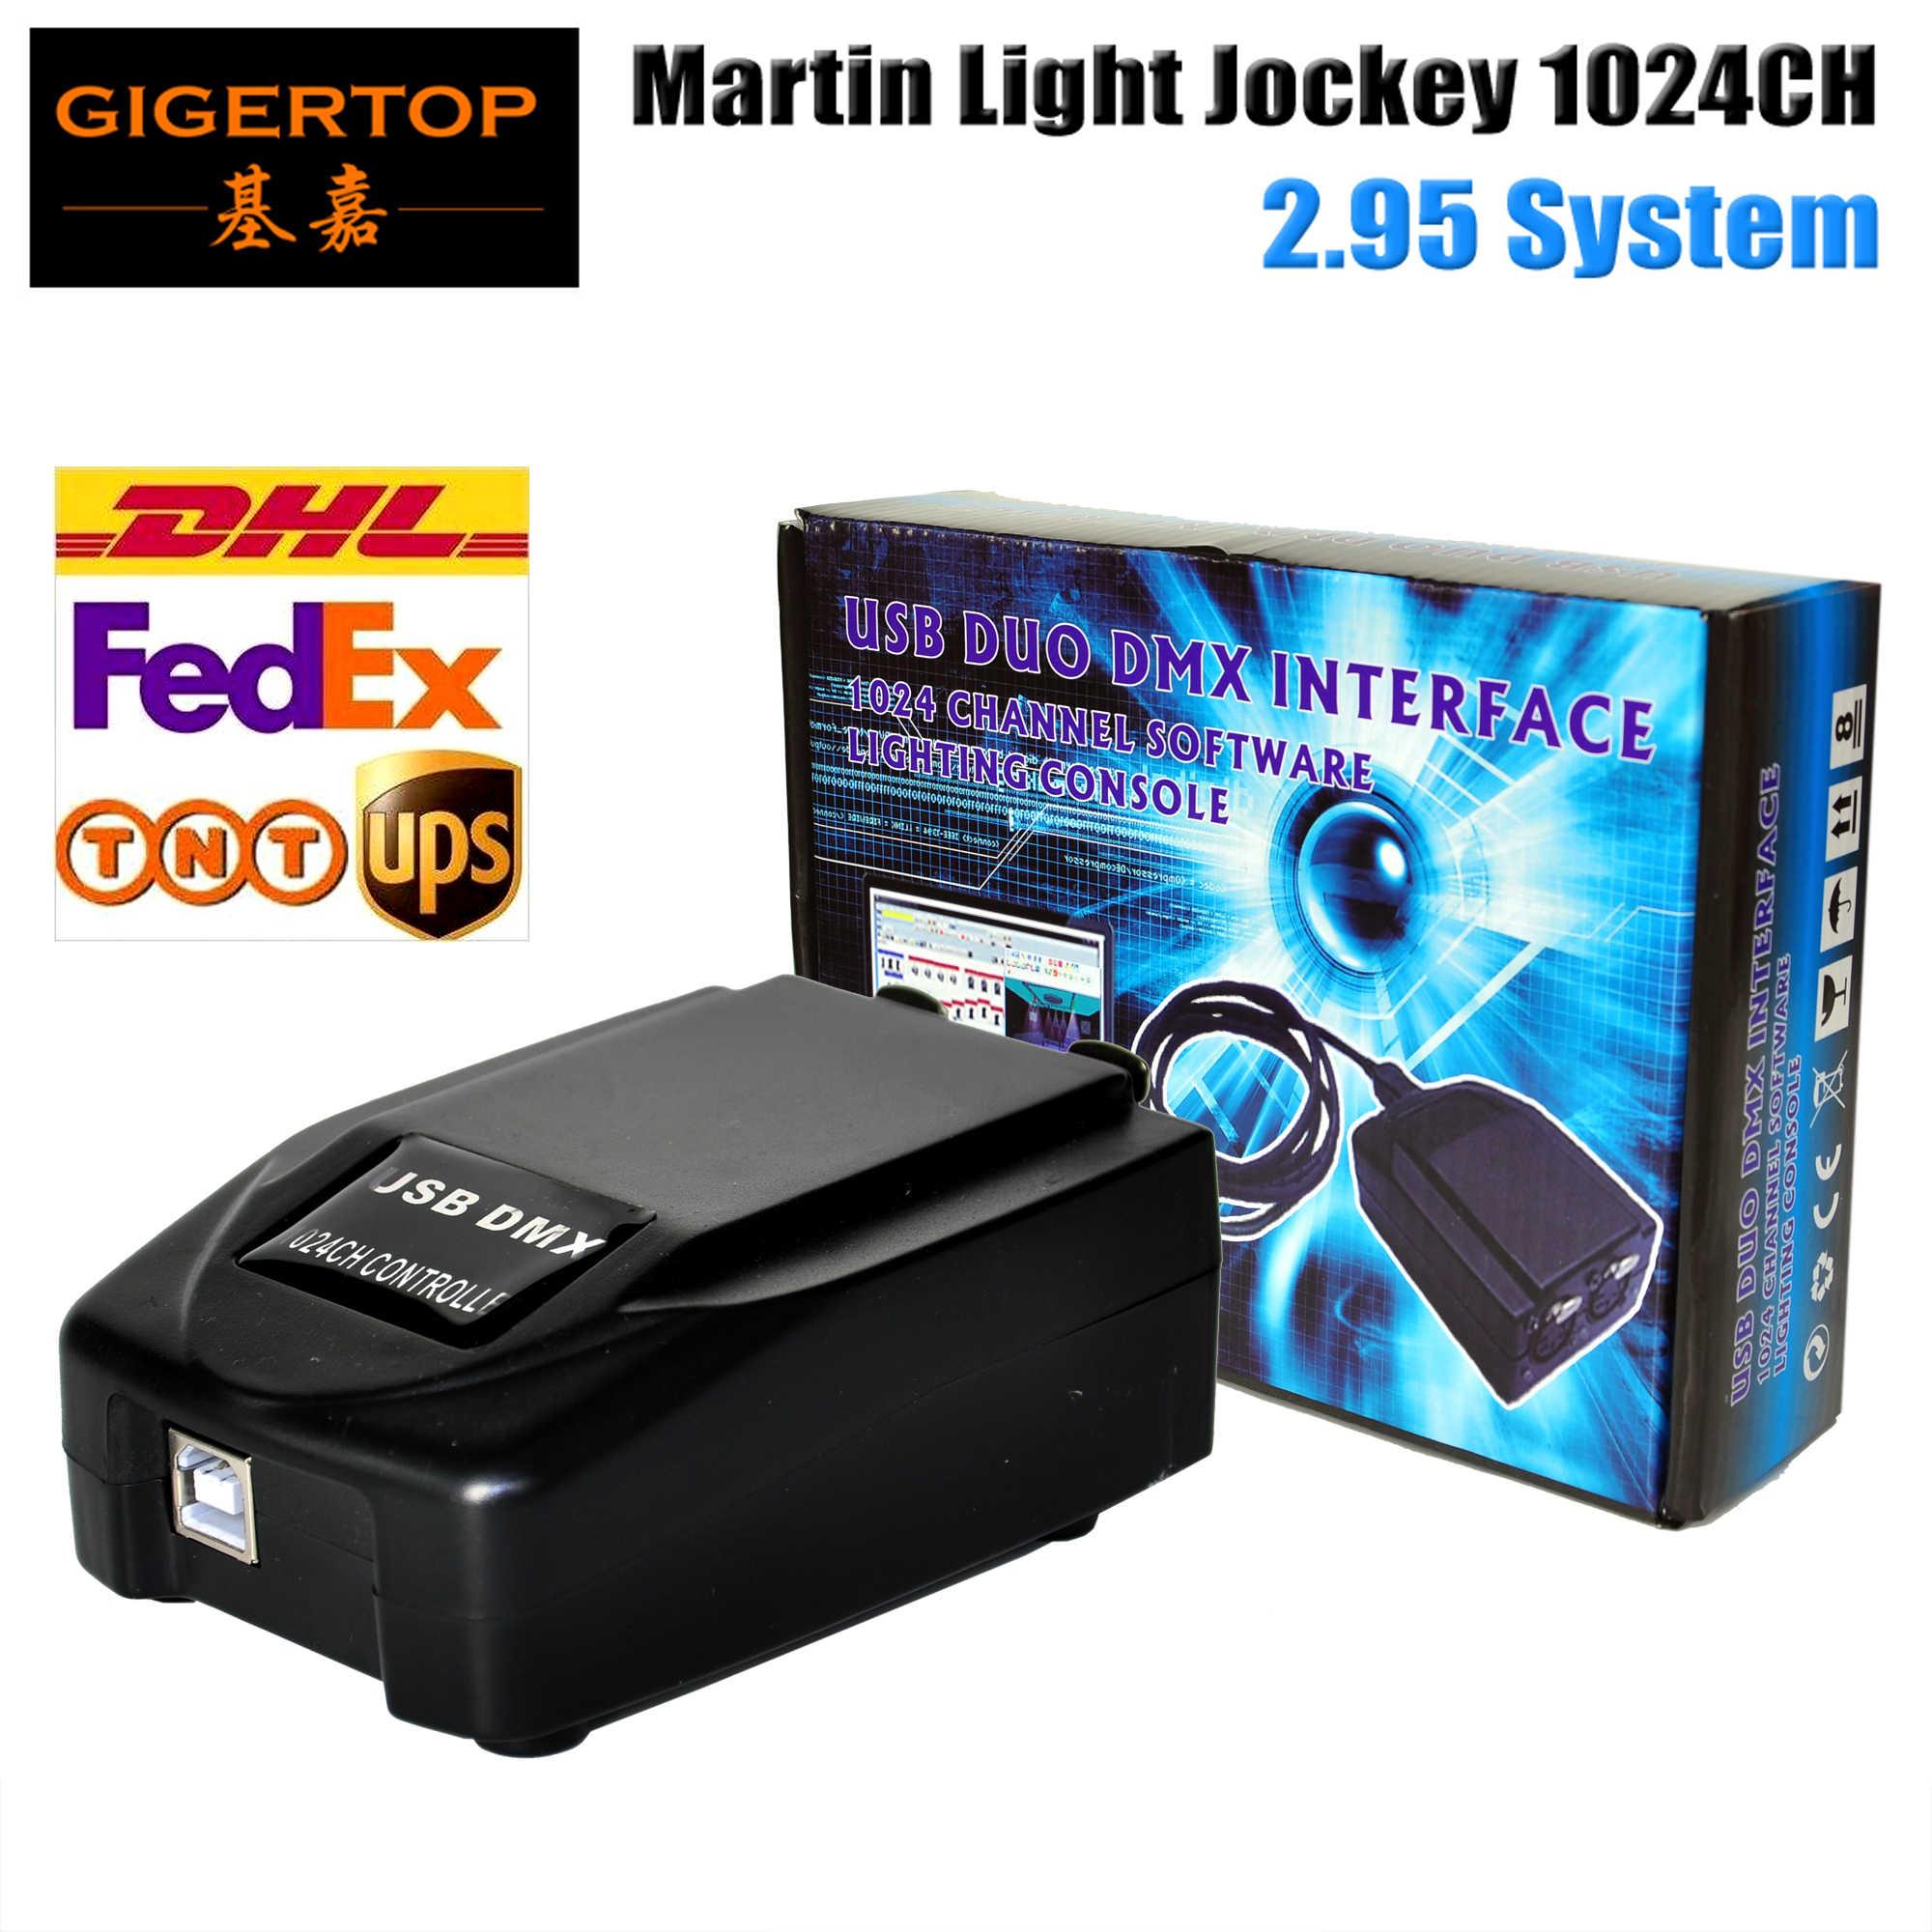 Martin Light Jockey 1024 Usb Controller